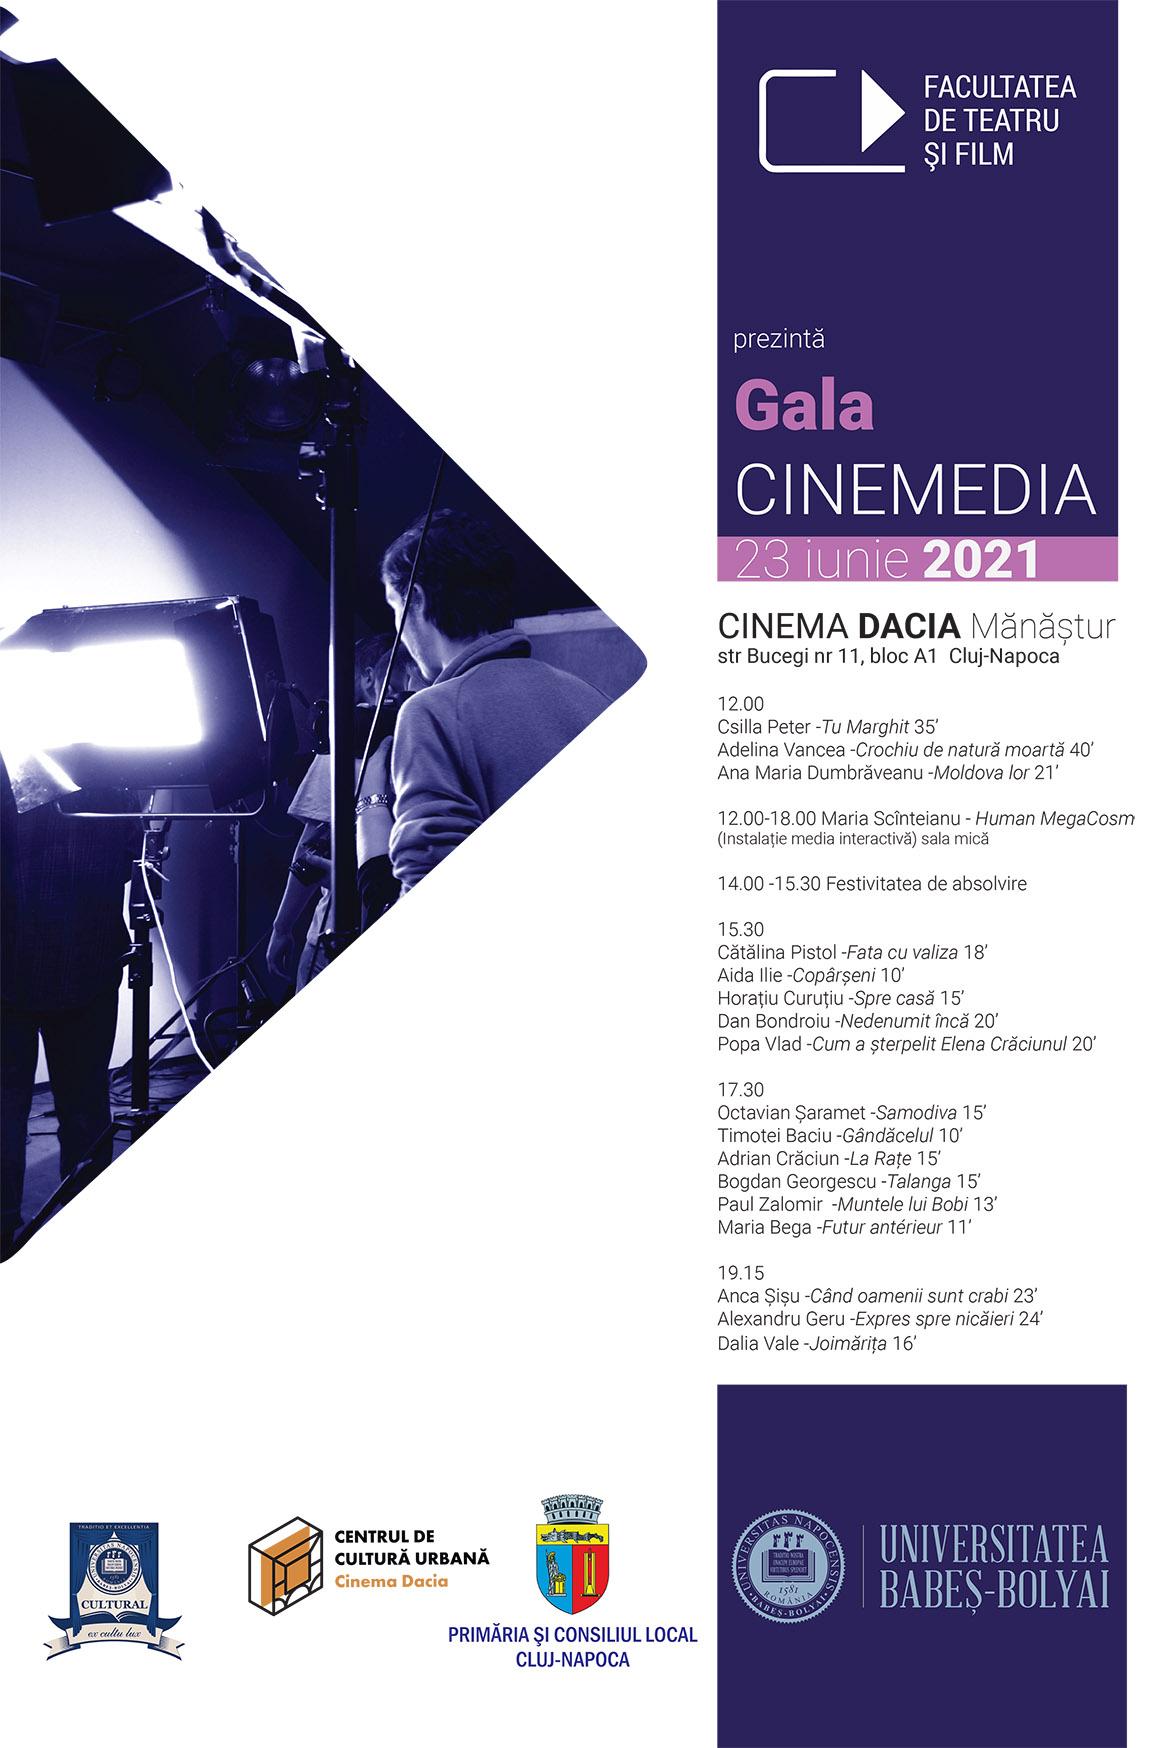 Gala CINEMEDIA